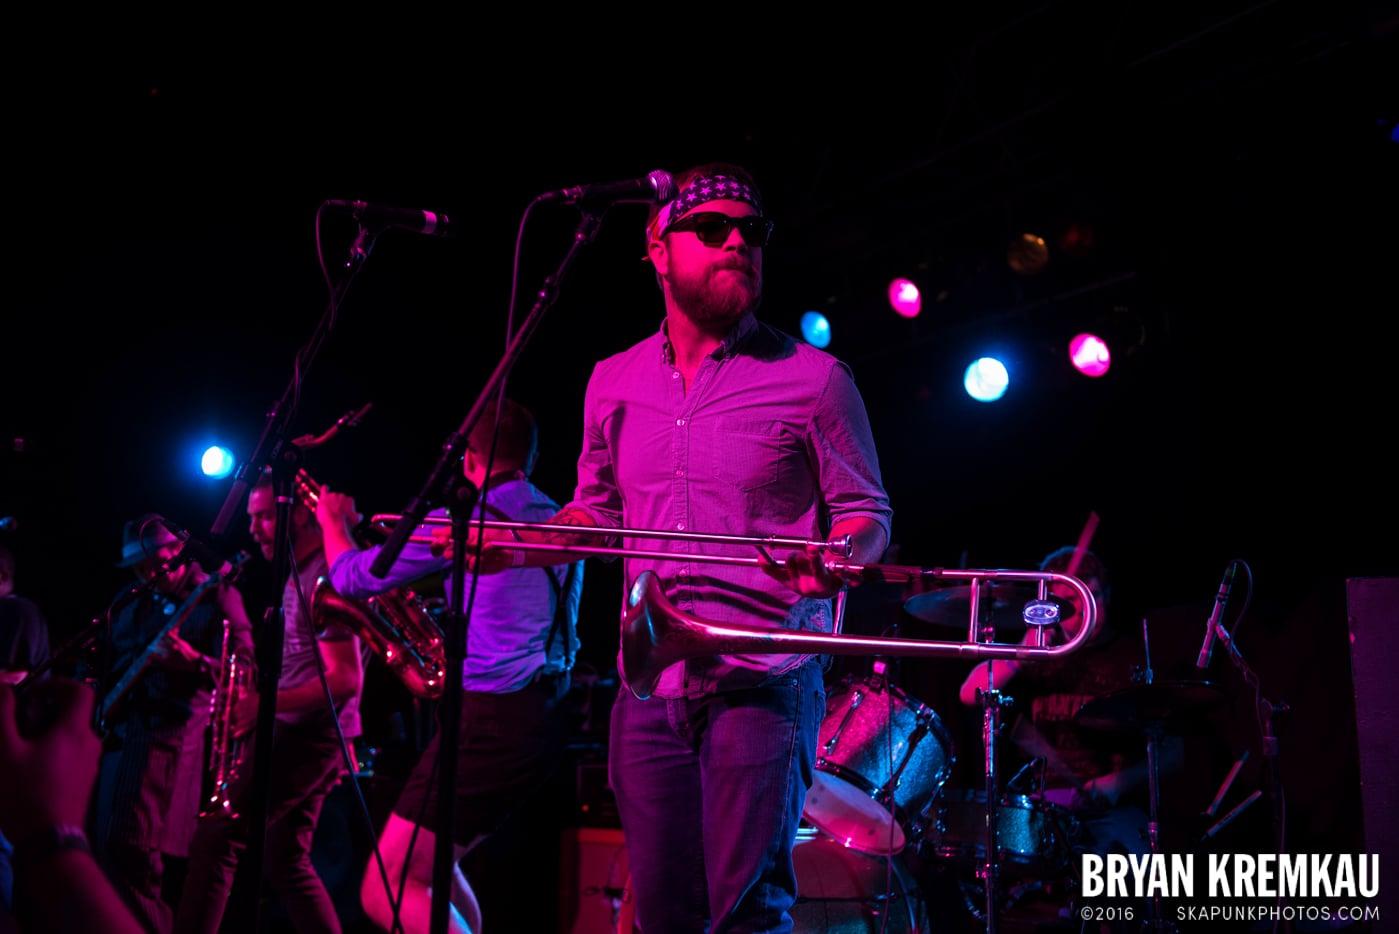 Backyard Superheroes @ Starland Ballroom, Sayreville, NJ - 11.9.13 (15)